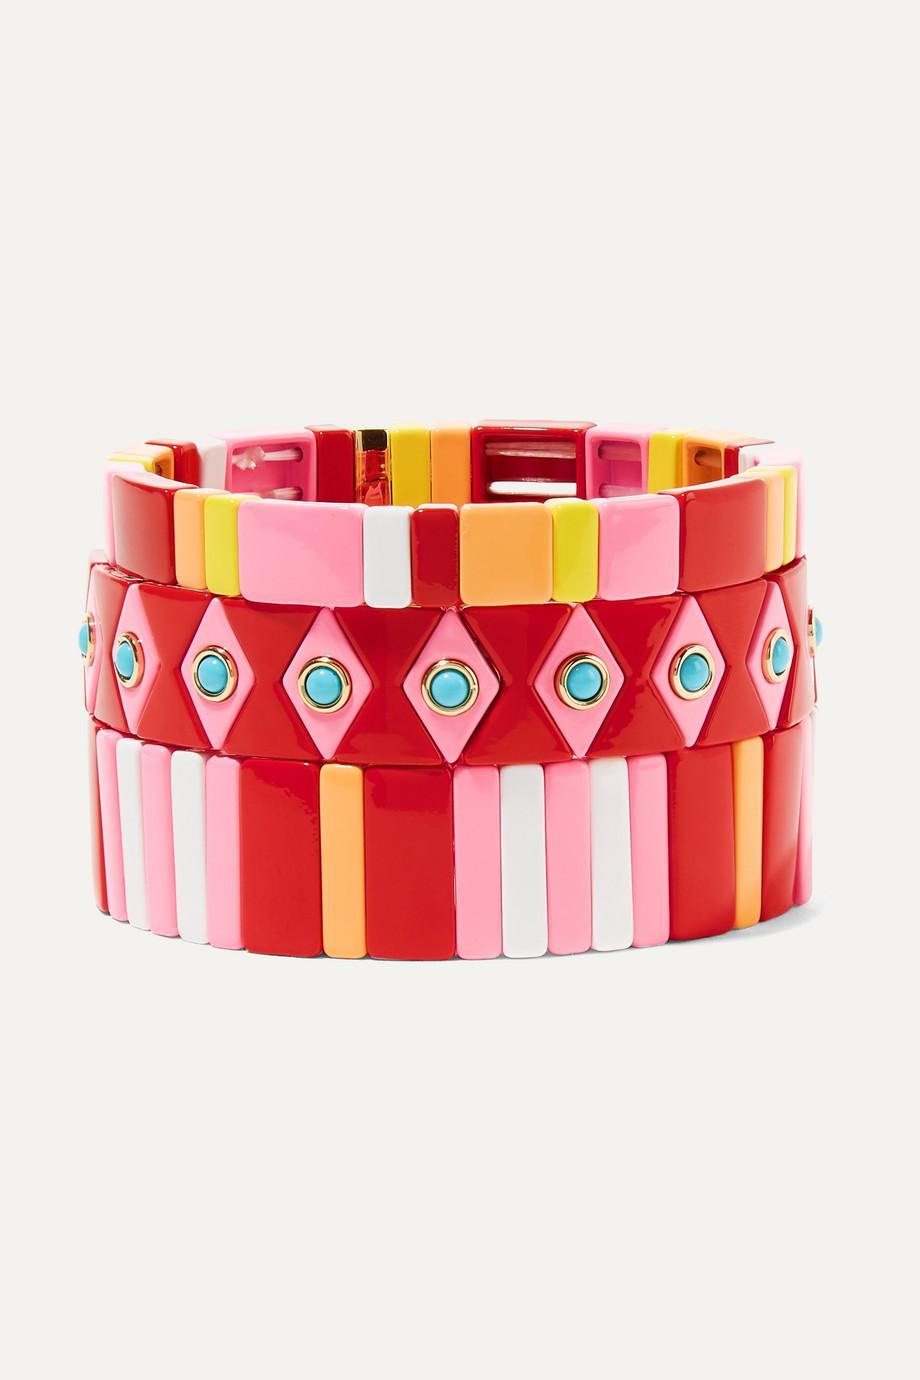 Roxanne Assoulin Hibiscus 搪瓷手链(三条装)